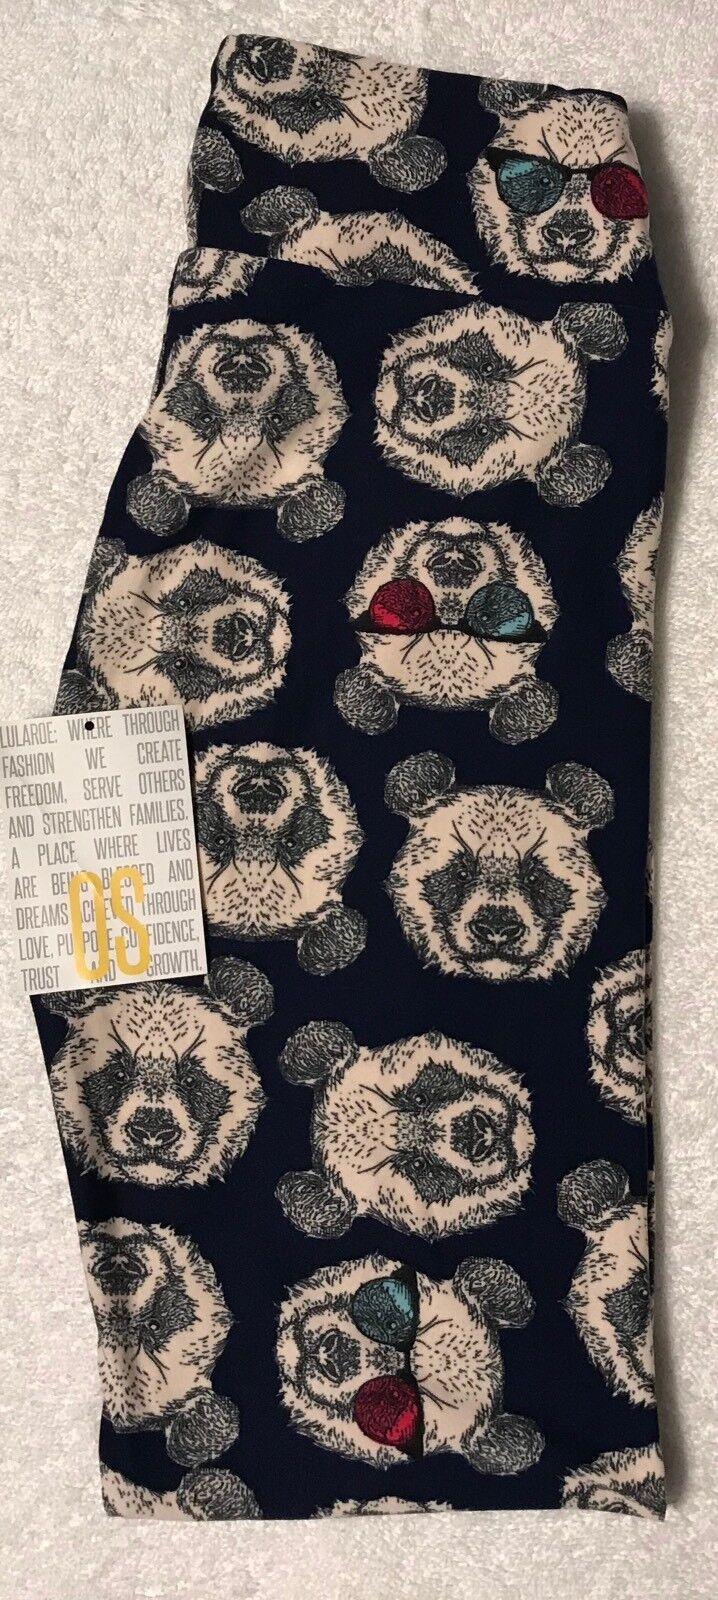 NEW LuLaRoe OS Hipster Panda Bear Sunglasses UNICORN Leggings